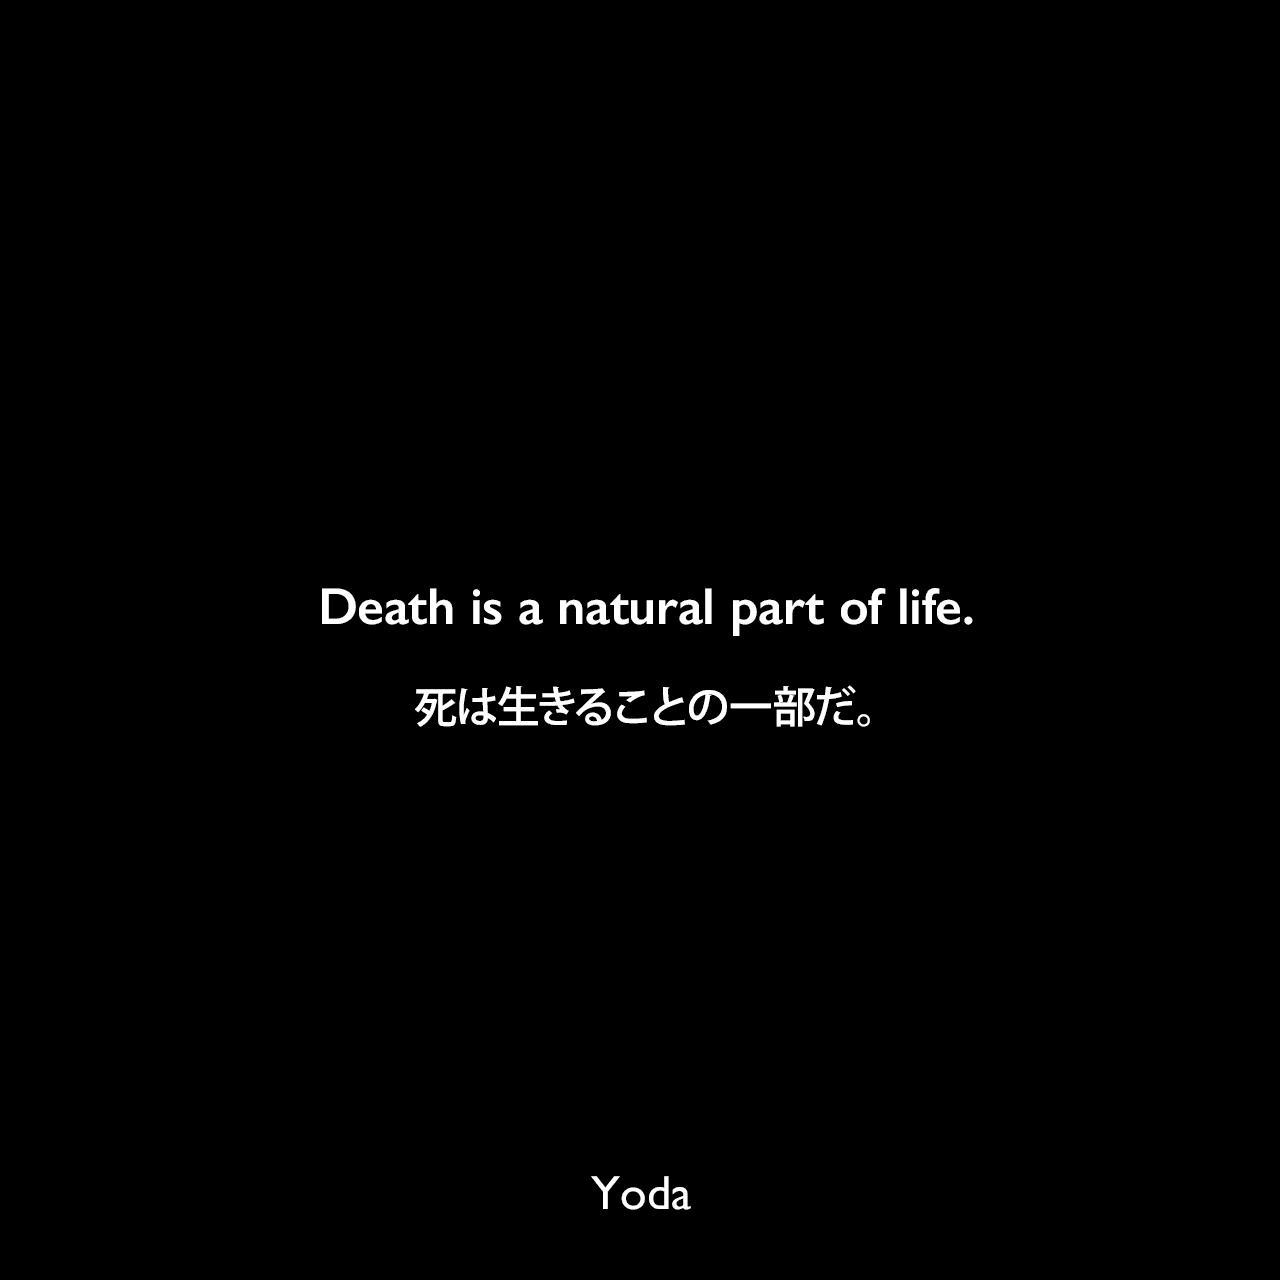 Death is a natural part of life.死は生きることの一部だ。- スター・ウォーズ エピソード3/シスの復讐Yoda